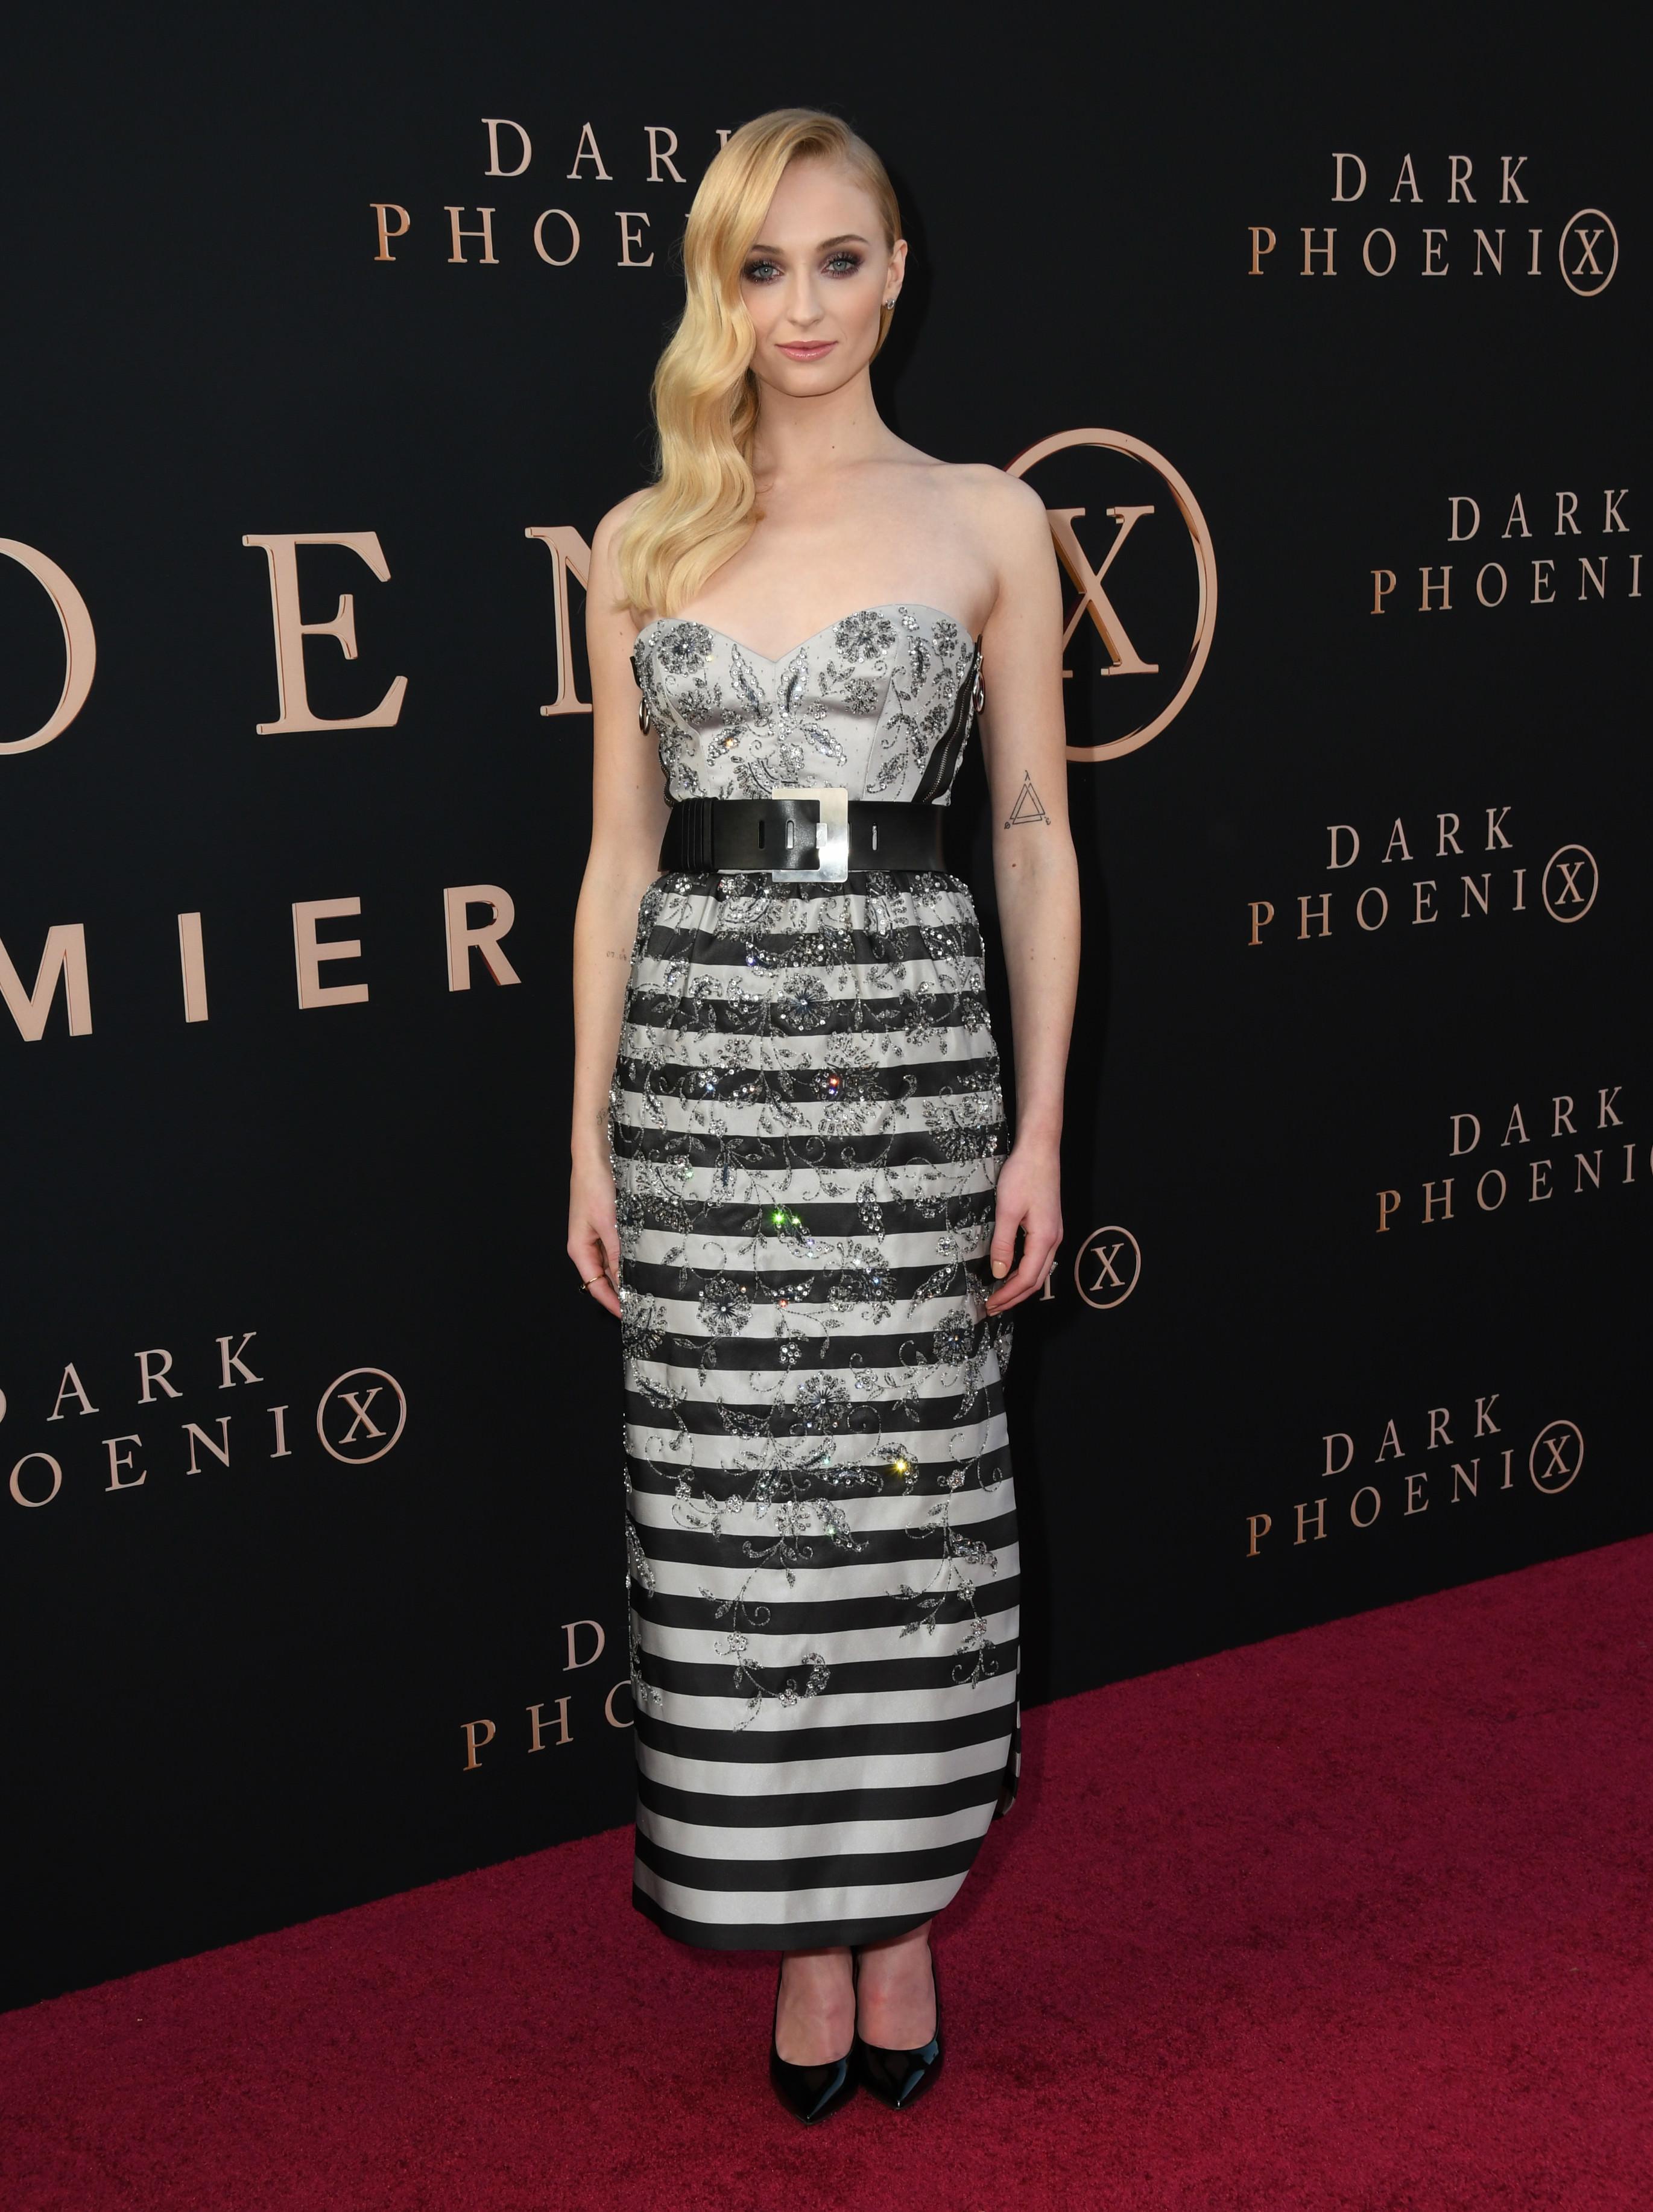 Sophie Turner Sizzling At Dark Phoenix Premiere In Hollywood